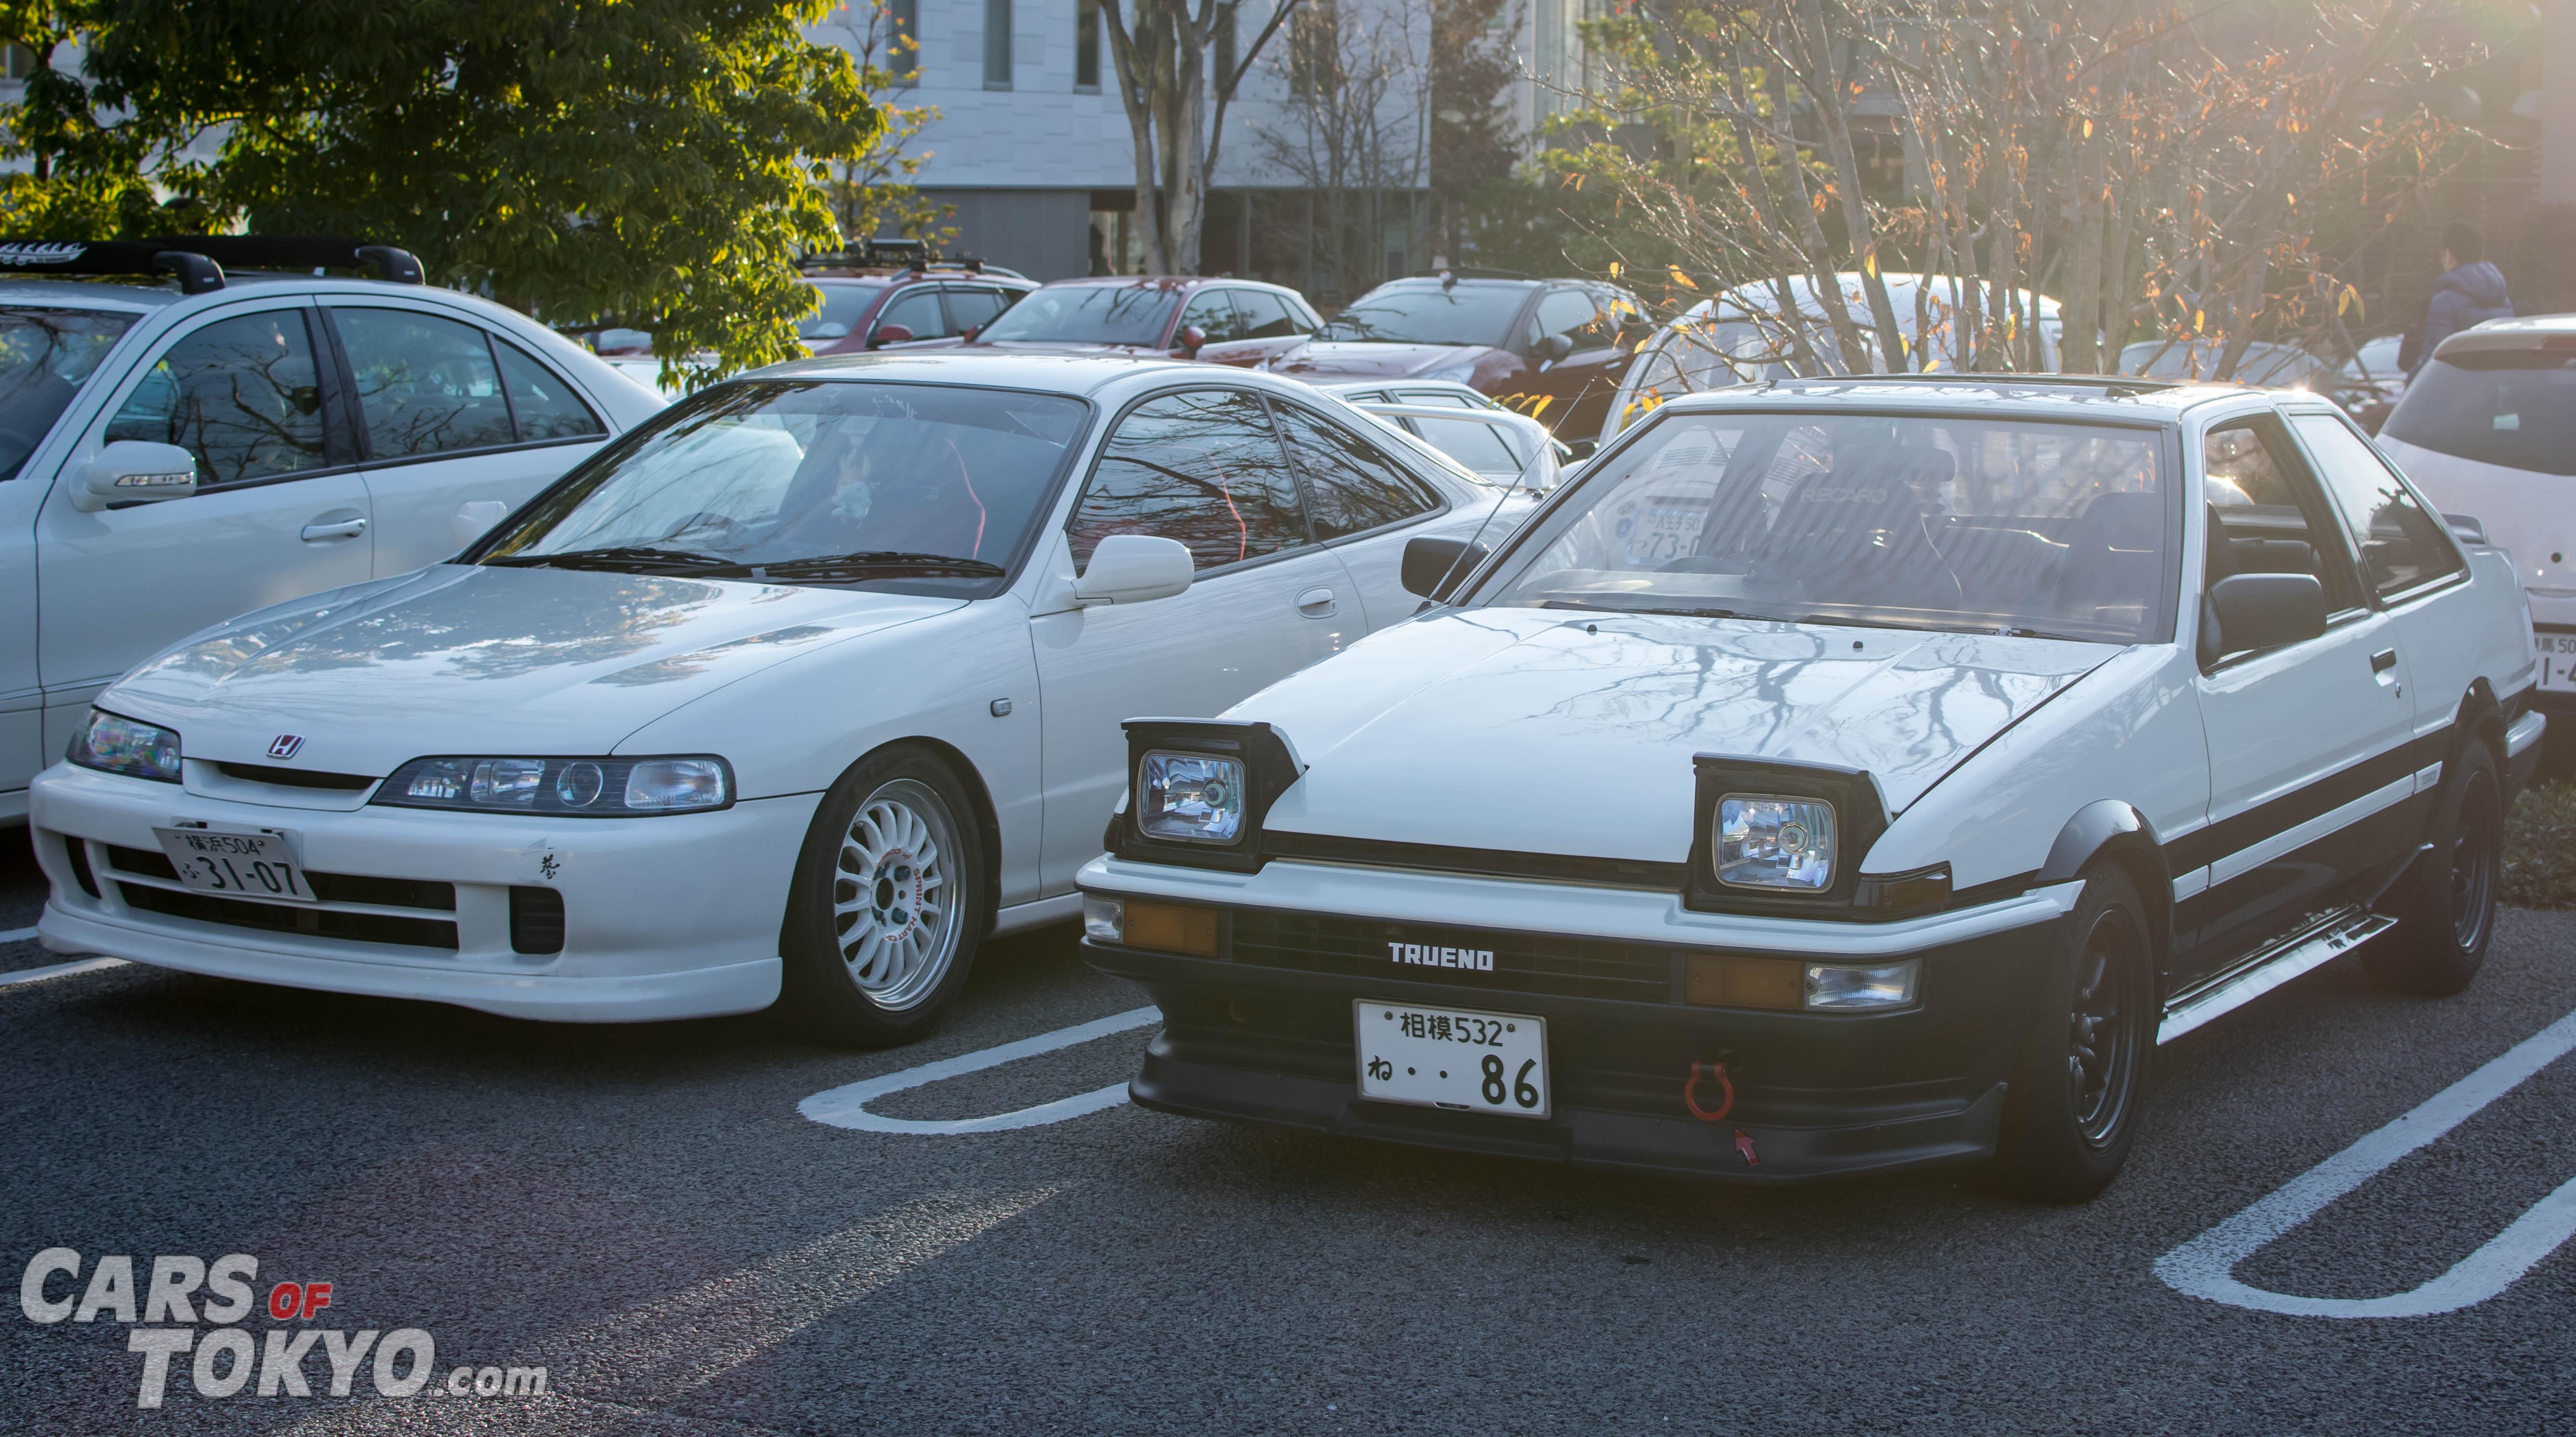 Cars of Tokyo Daikanyama Toyota Trueno & Honda Integra